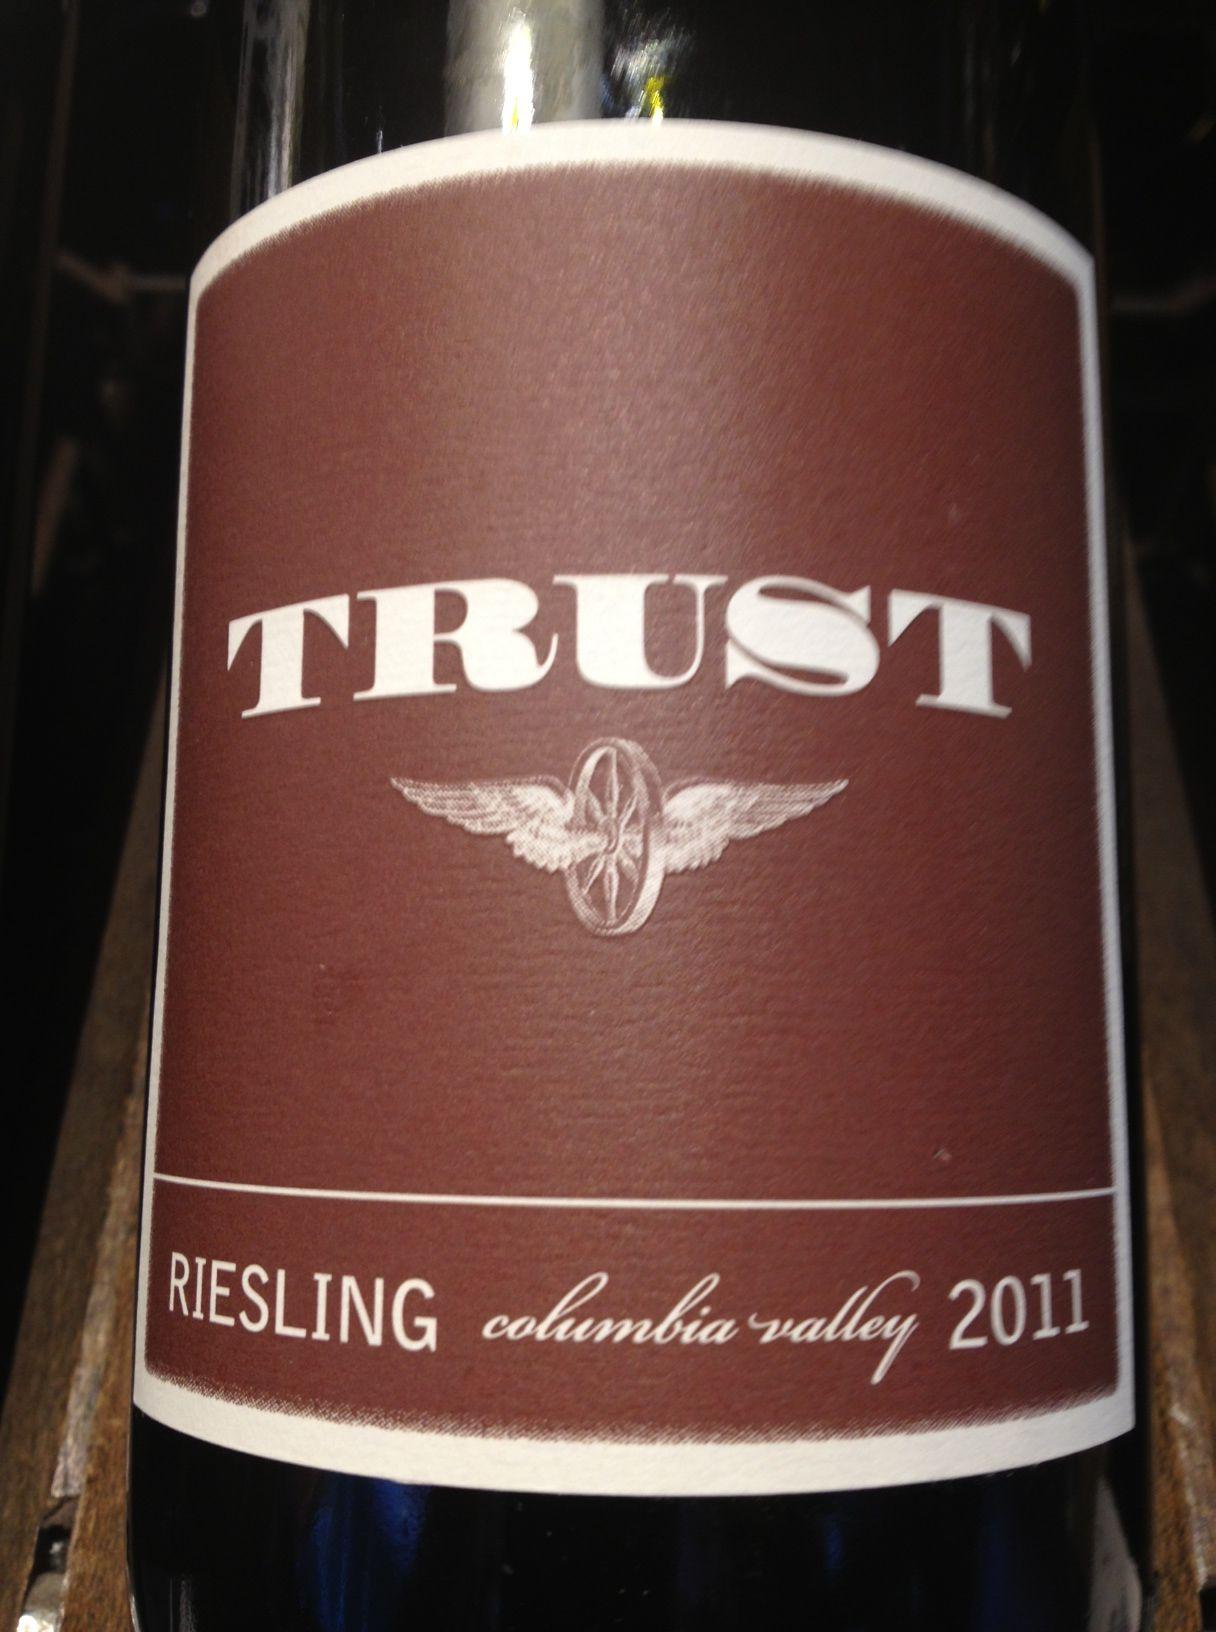 Drink Me Trust Riesling Riesling Just Wine Wine Paring